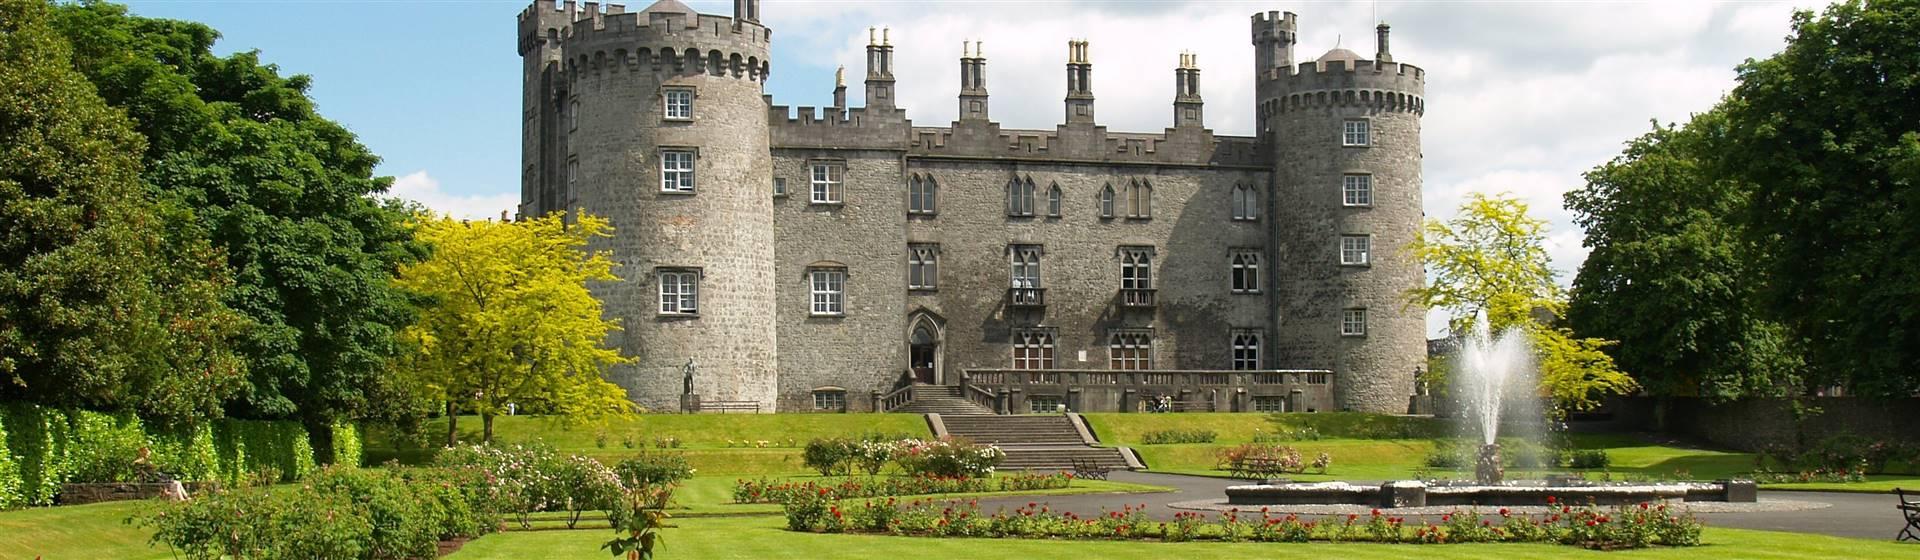 Kilkenny, Waterford & Copper Coast